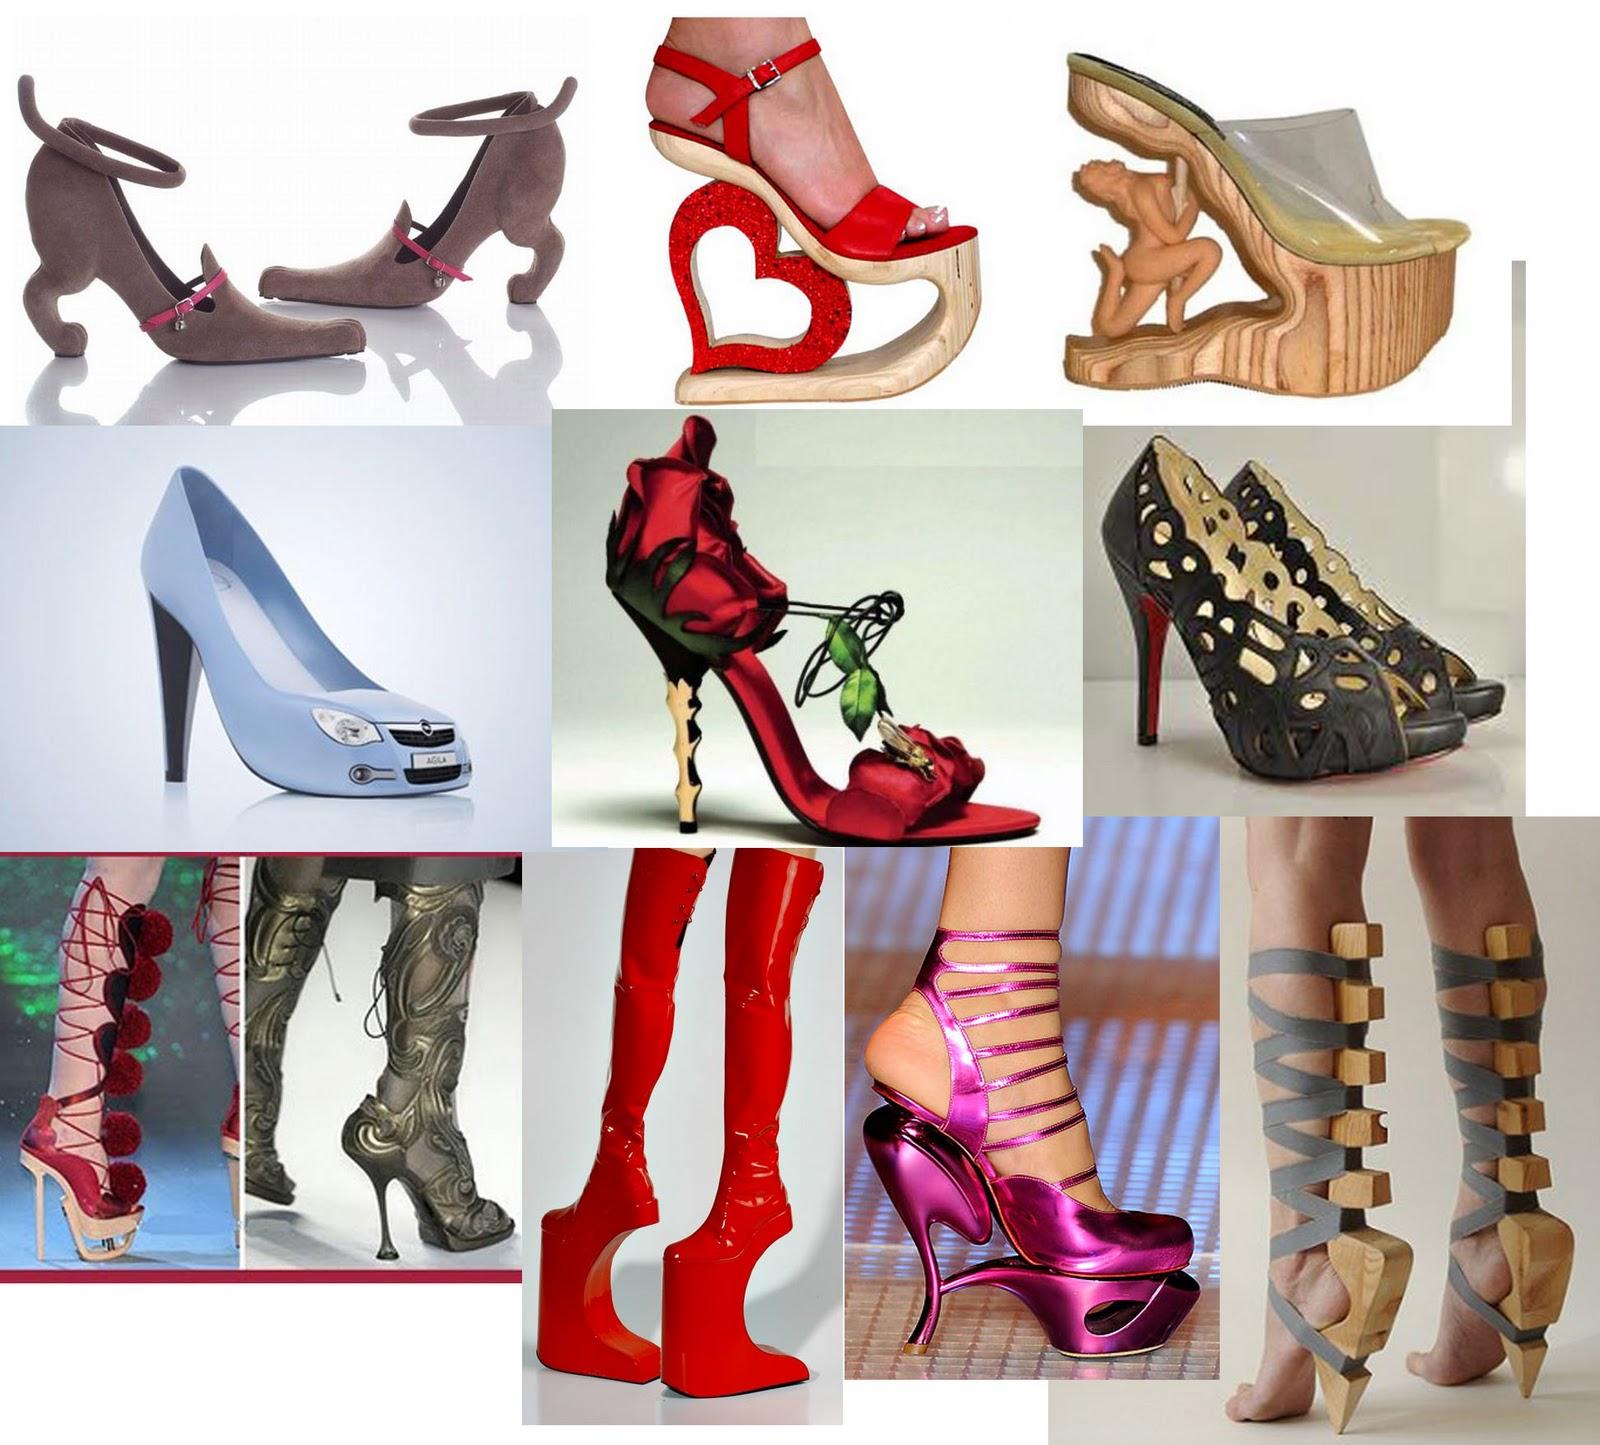 http://4.bp.blogspot.com/_QvbO6SOBl4k/TPakdYGGq3I/AAAAAAAAAMk/WbTGW7kY0MQ/s1600/shoes.jpg